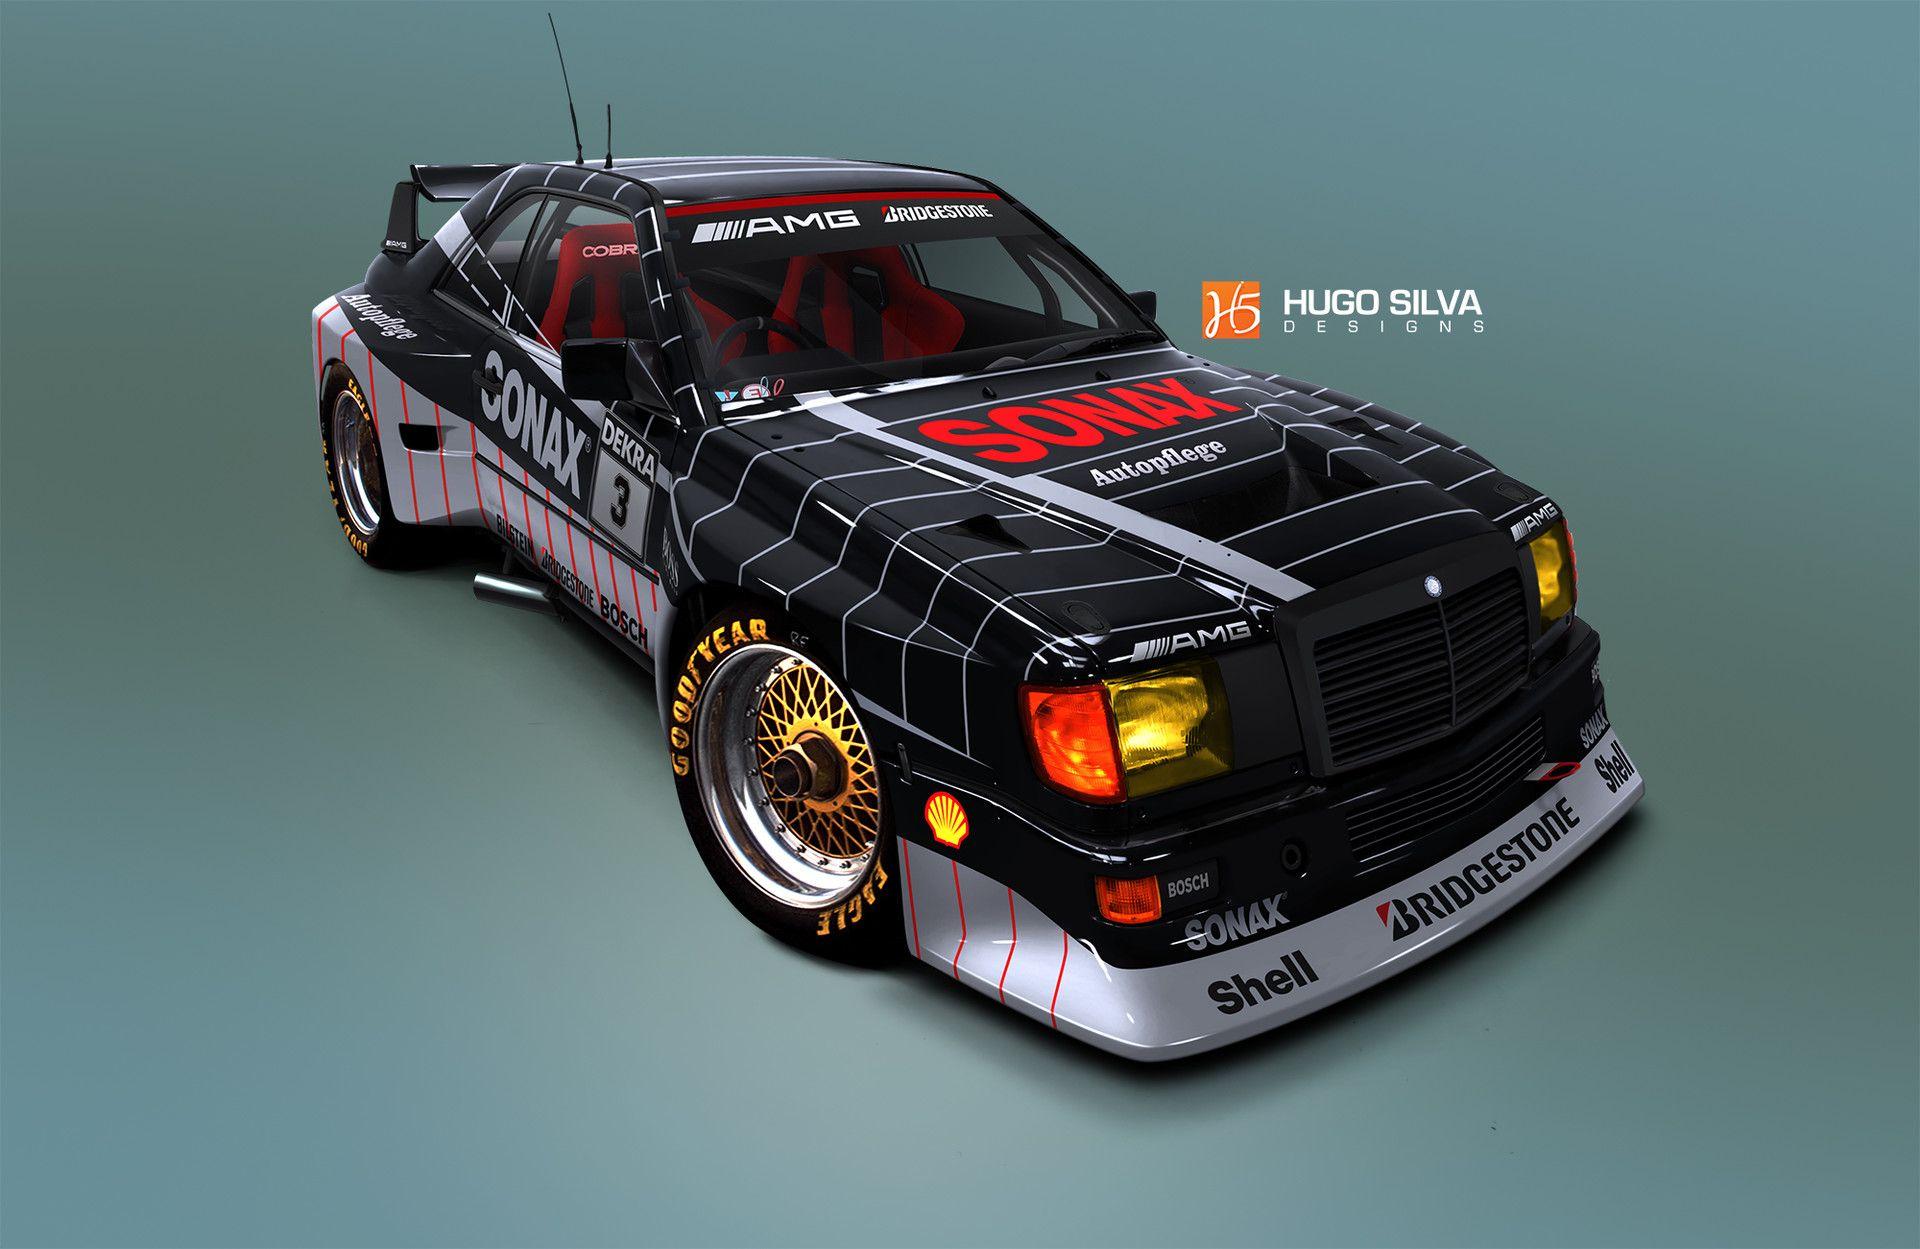 ArtStation - Mercedes Benz W124 e300 race car, Hugo Silva ...